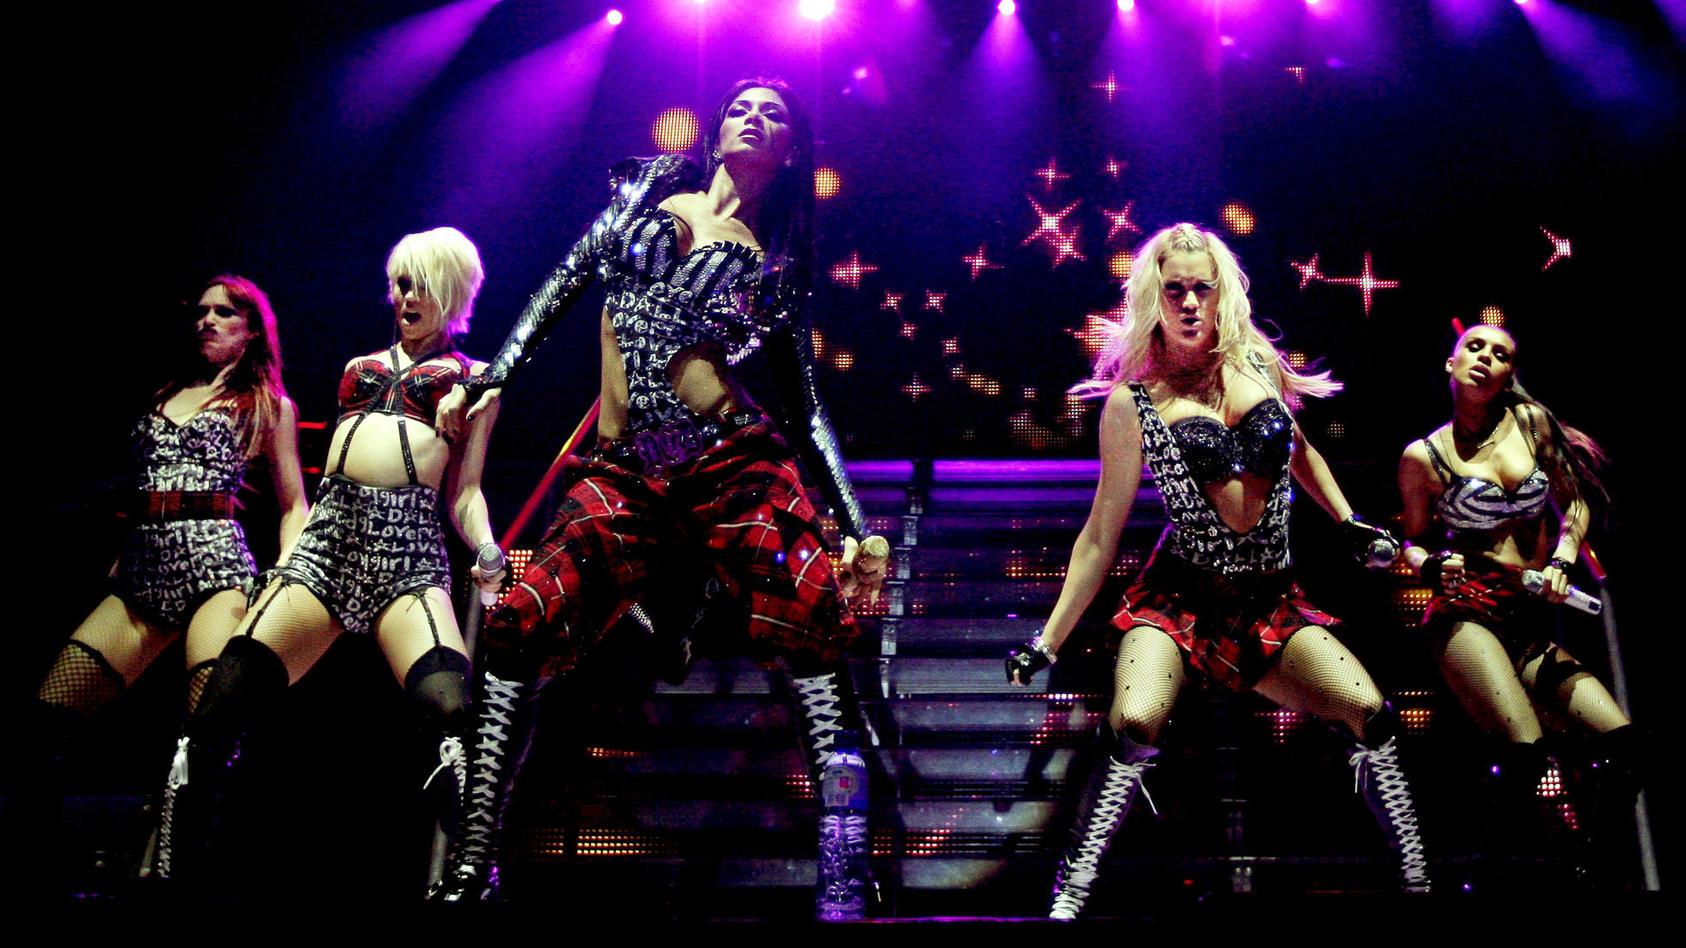 Die Pussycat Dolls 2009 in Amsterdam.